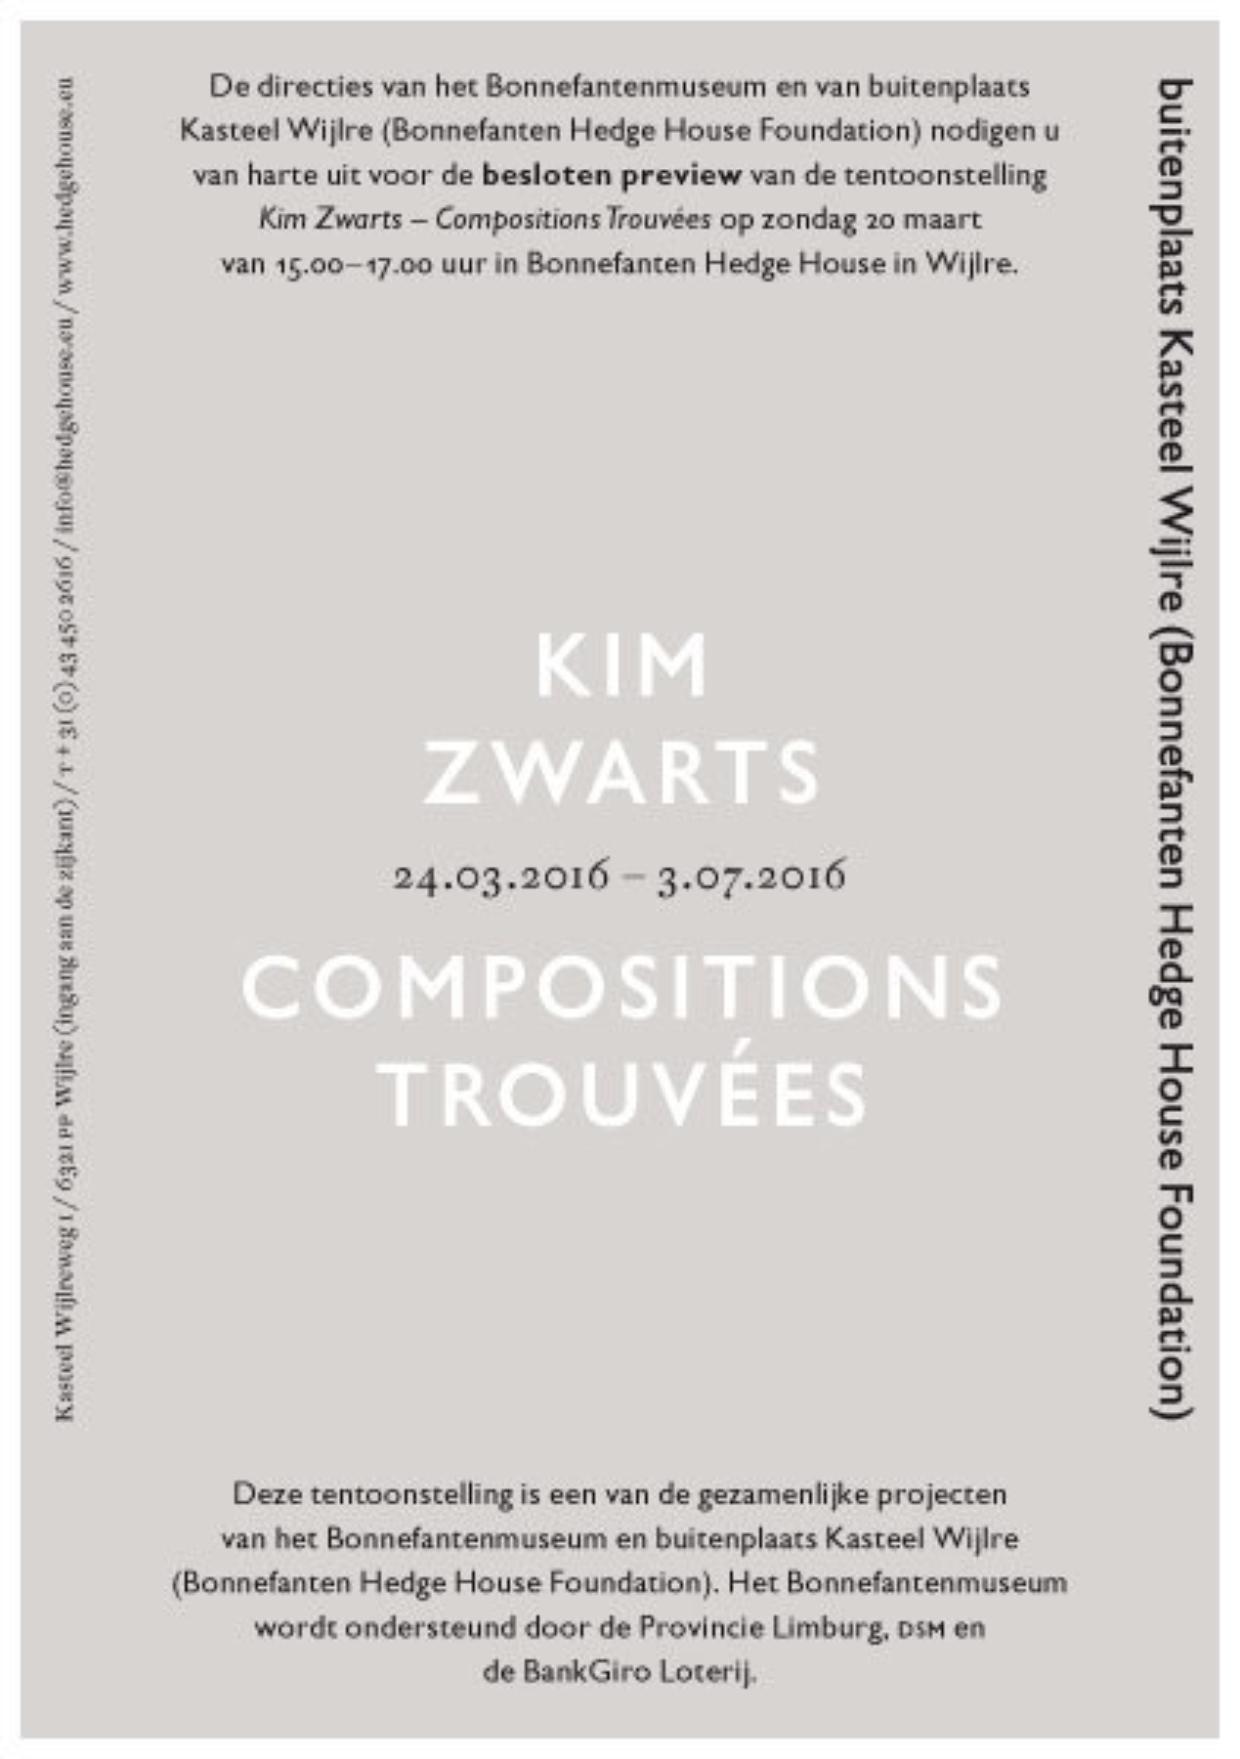 Zaalboekje Kim Zwarts